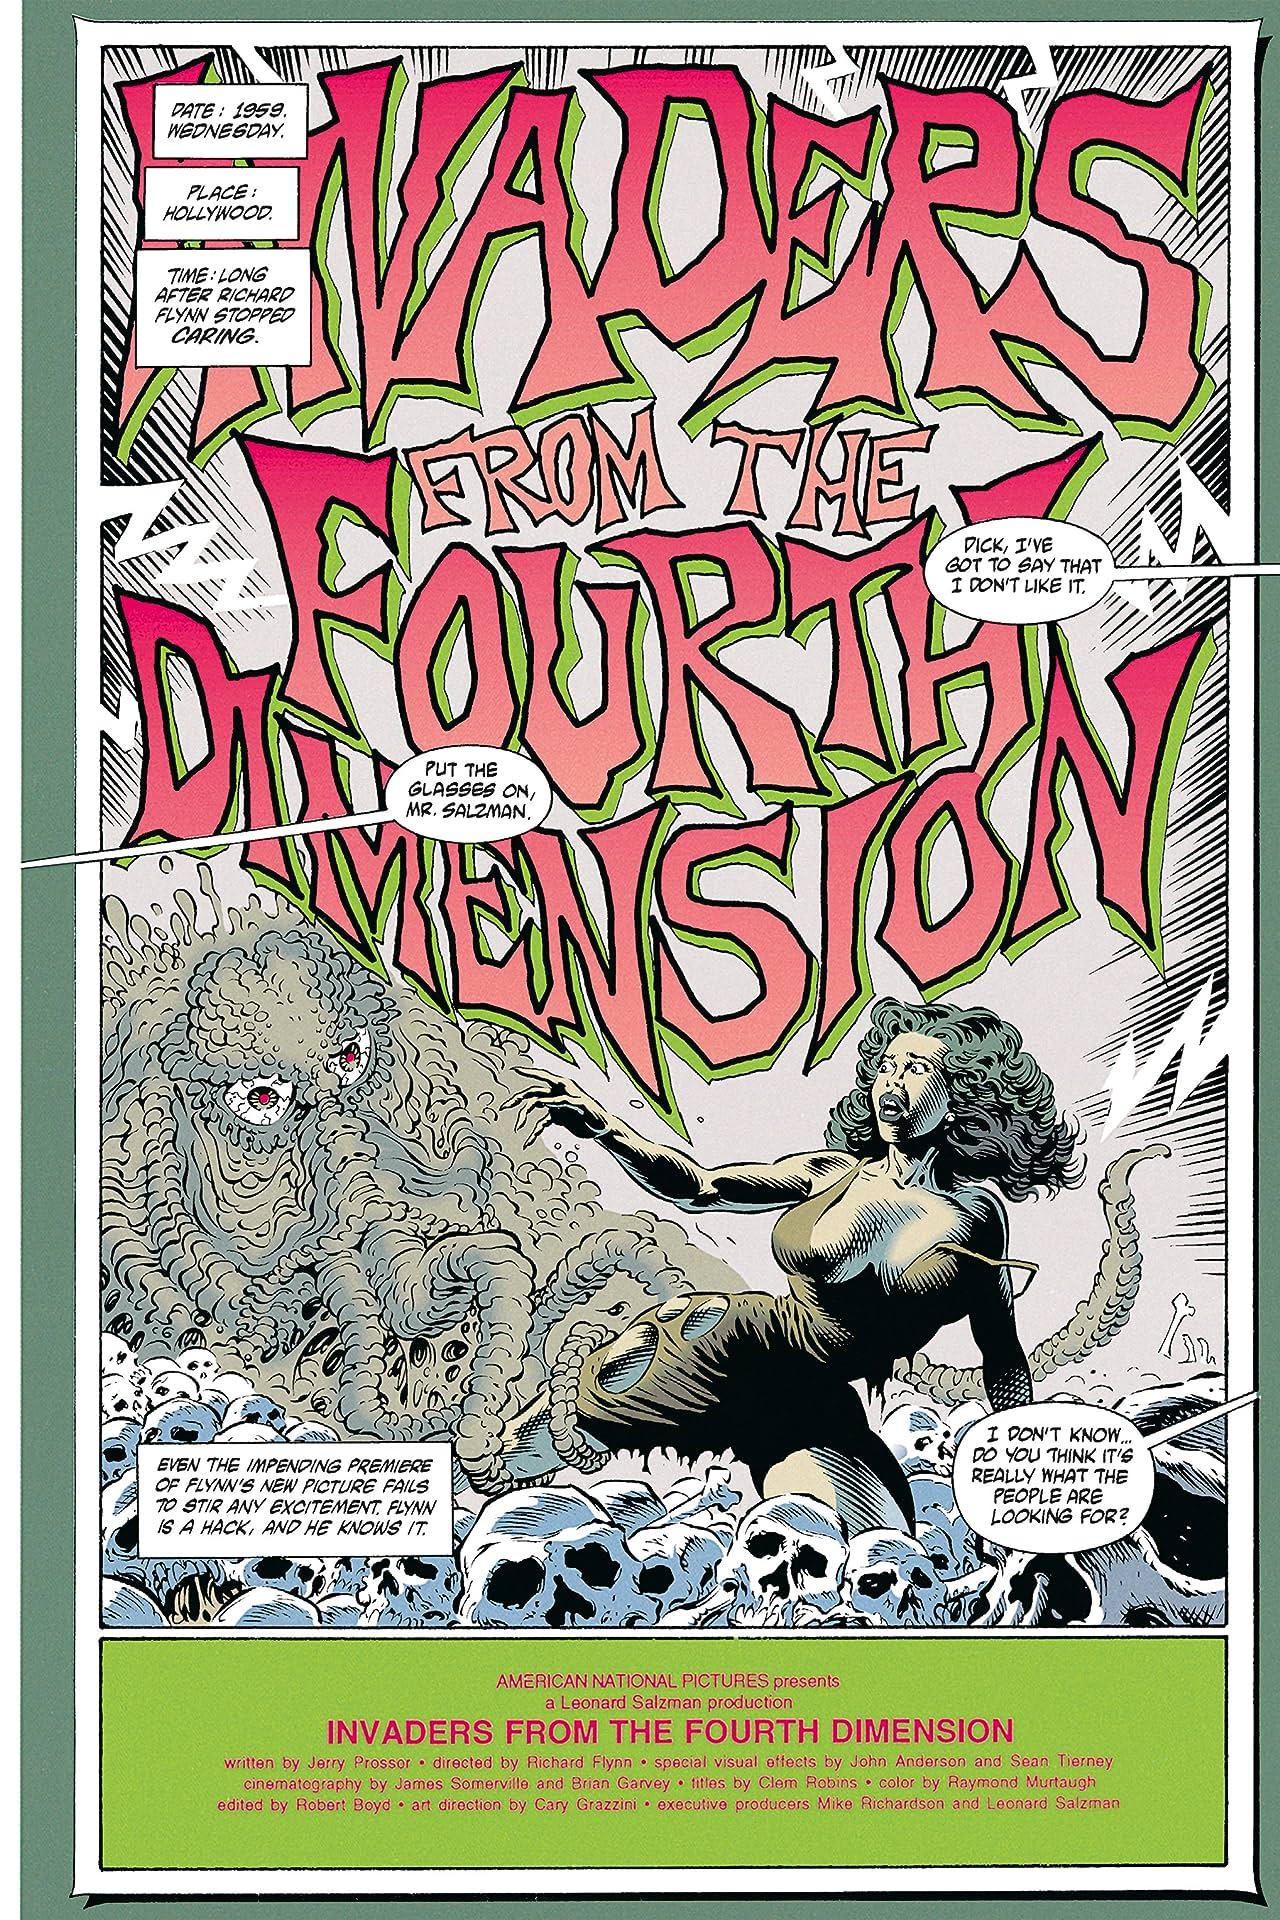 Predator: Invaders of the 4th Dimension #11